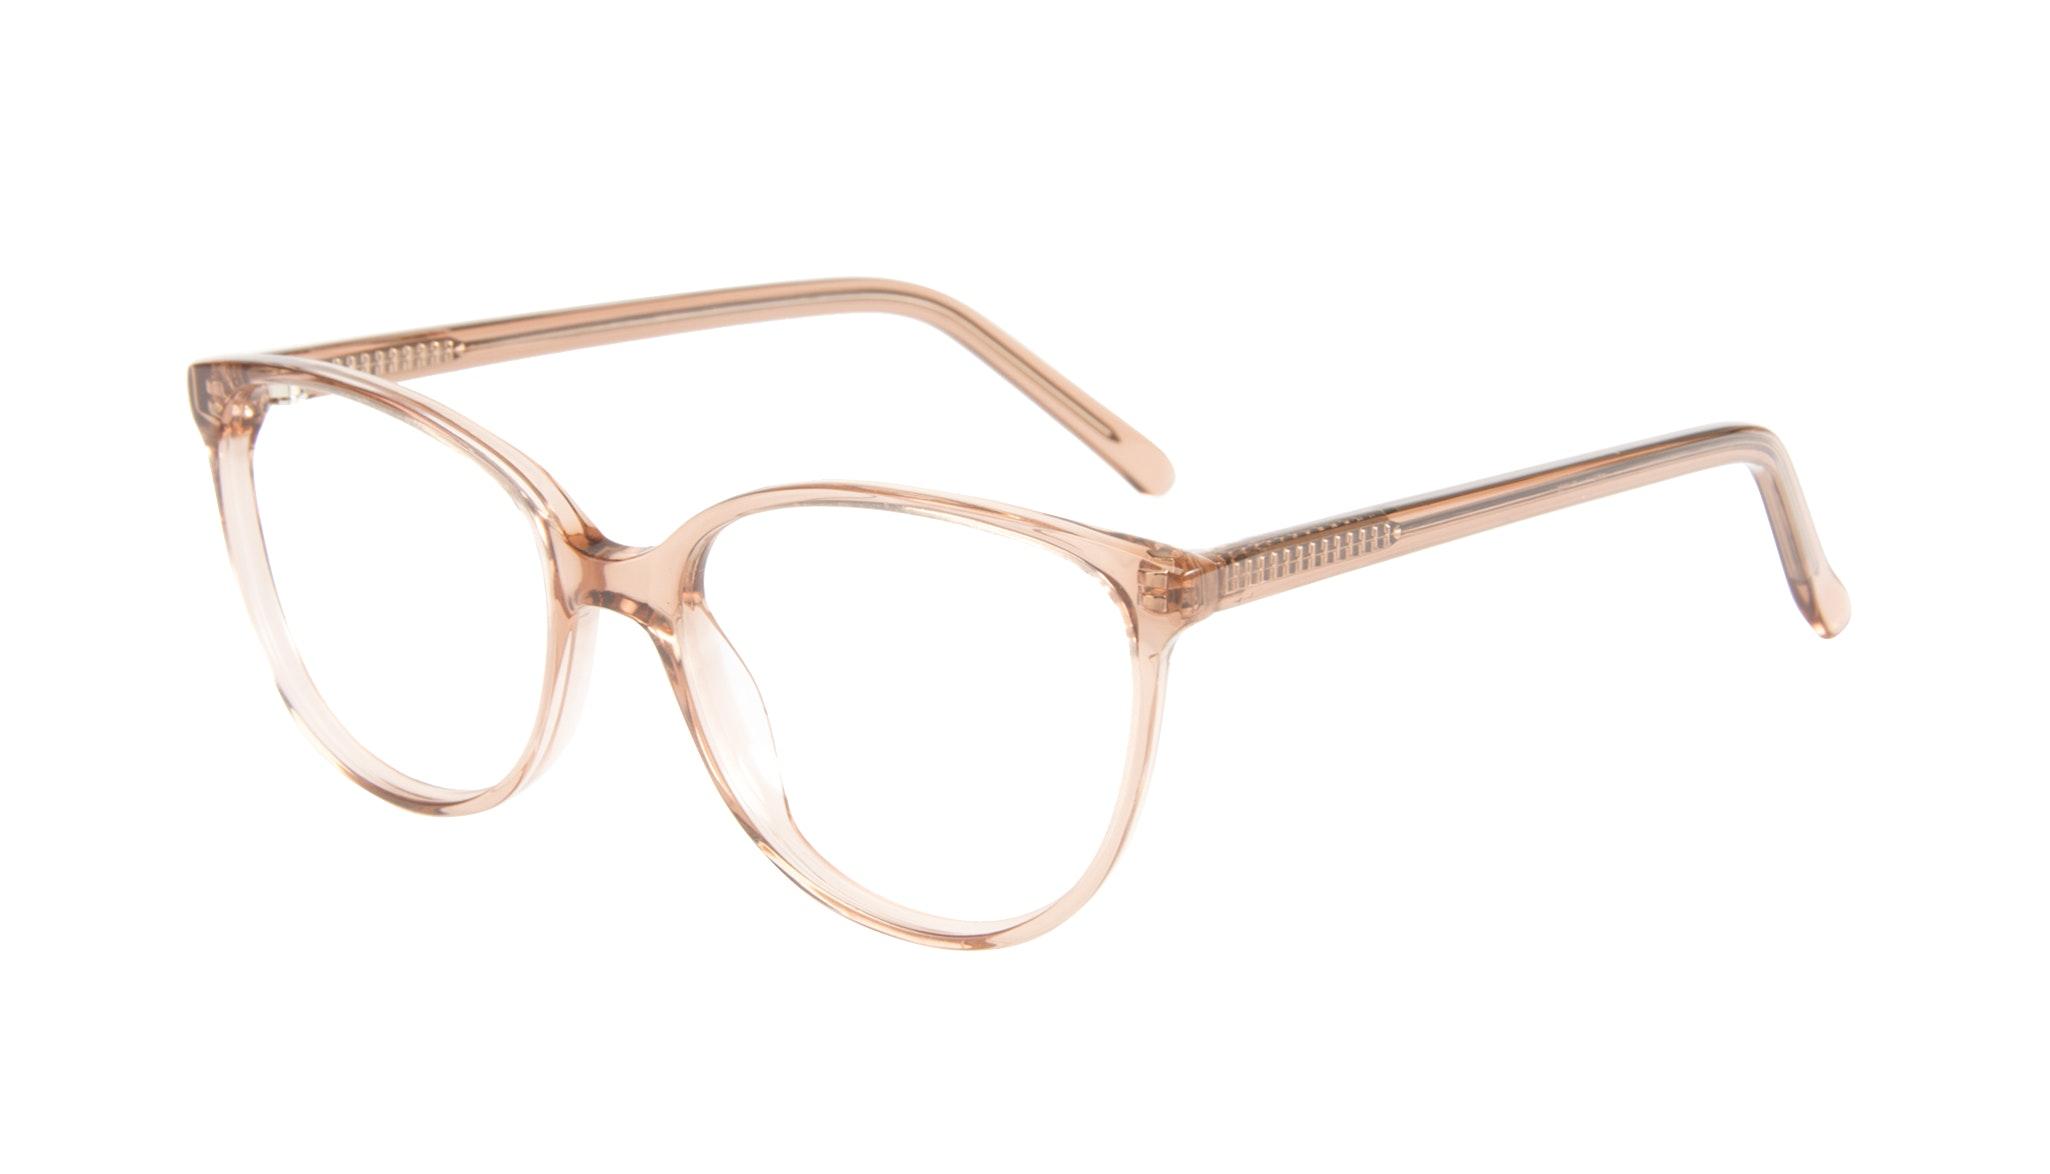 Affordable Fashion Glasses Round Eyeglasses Women Imagine Petite Rose Tilt